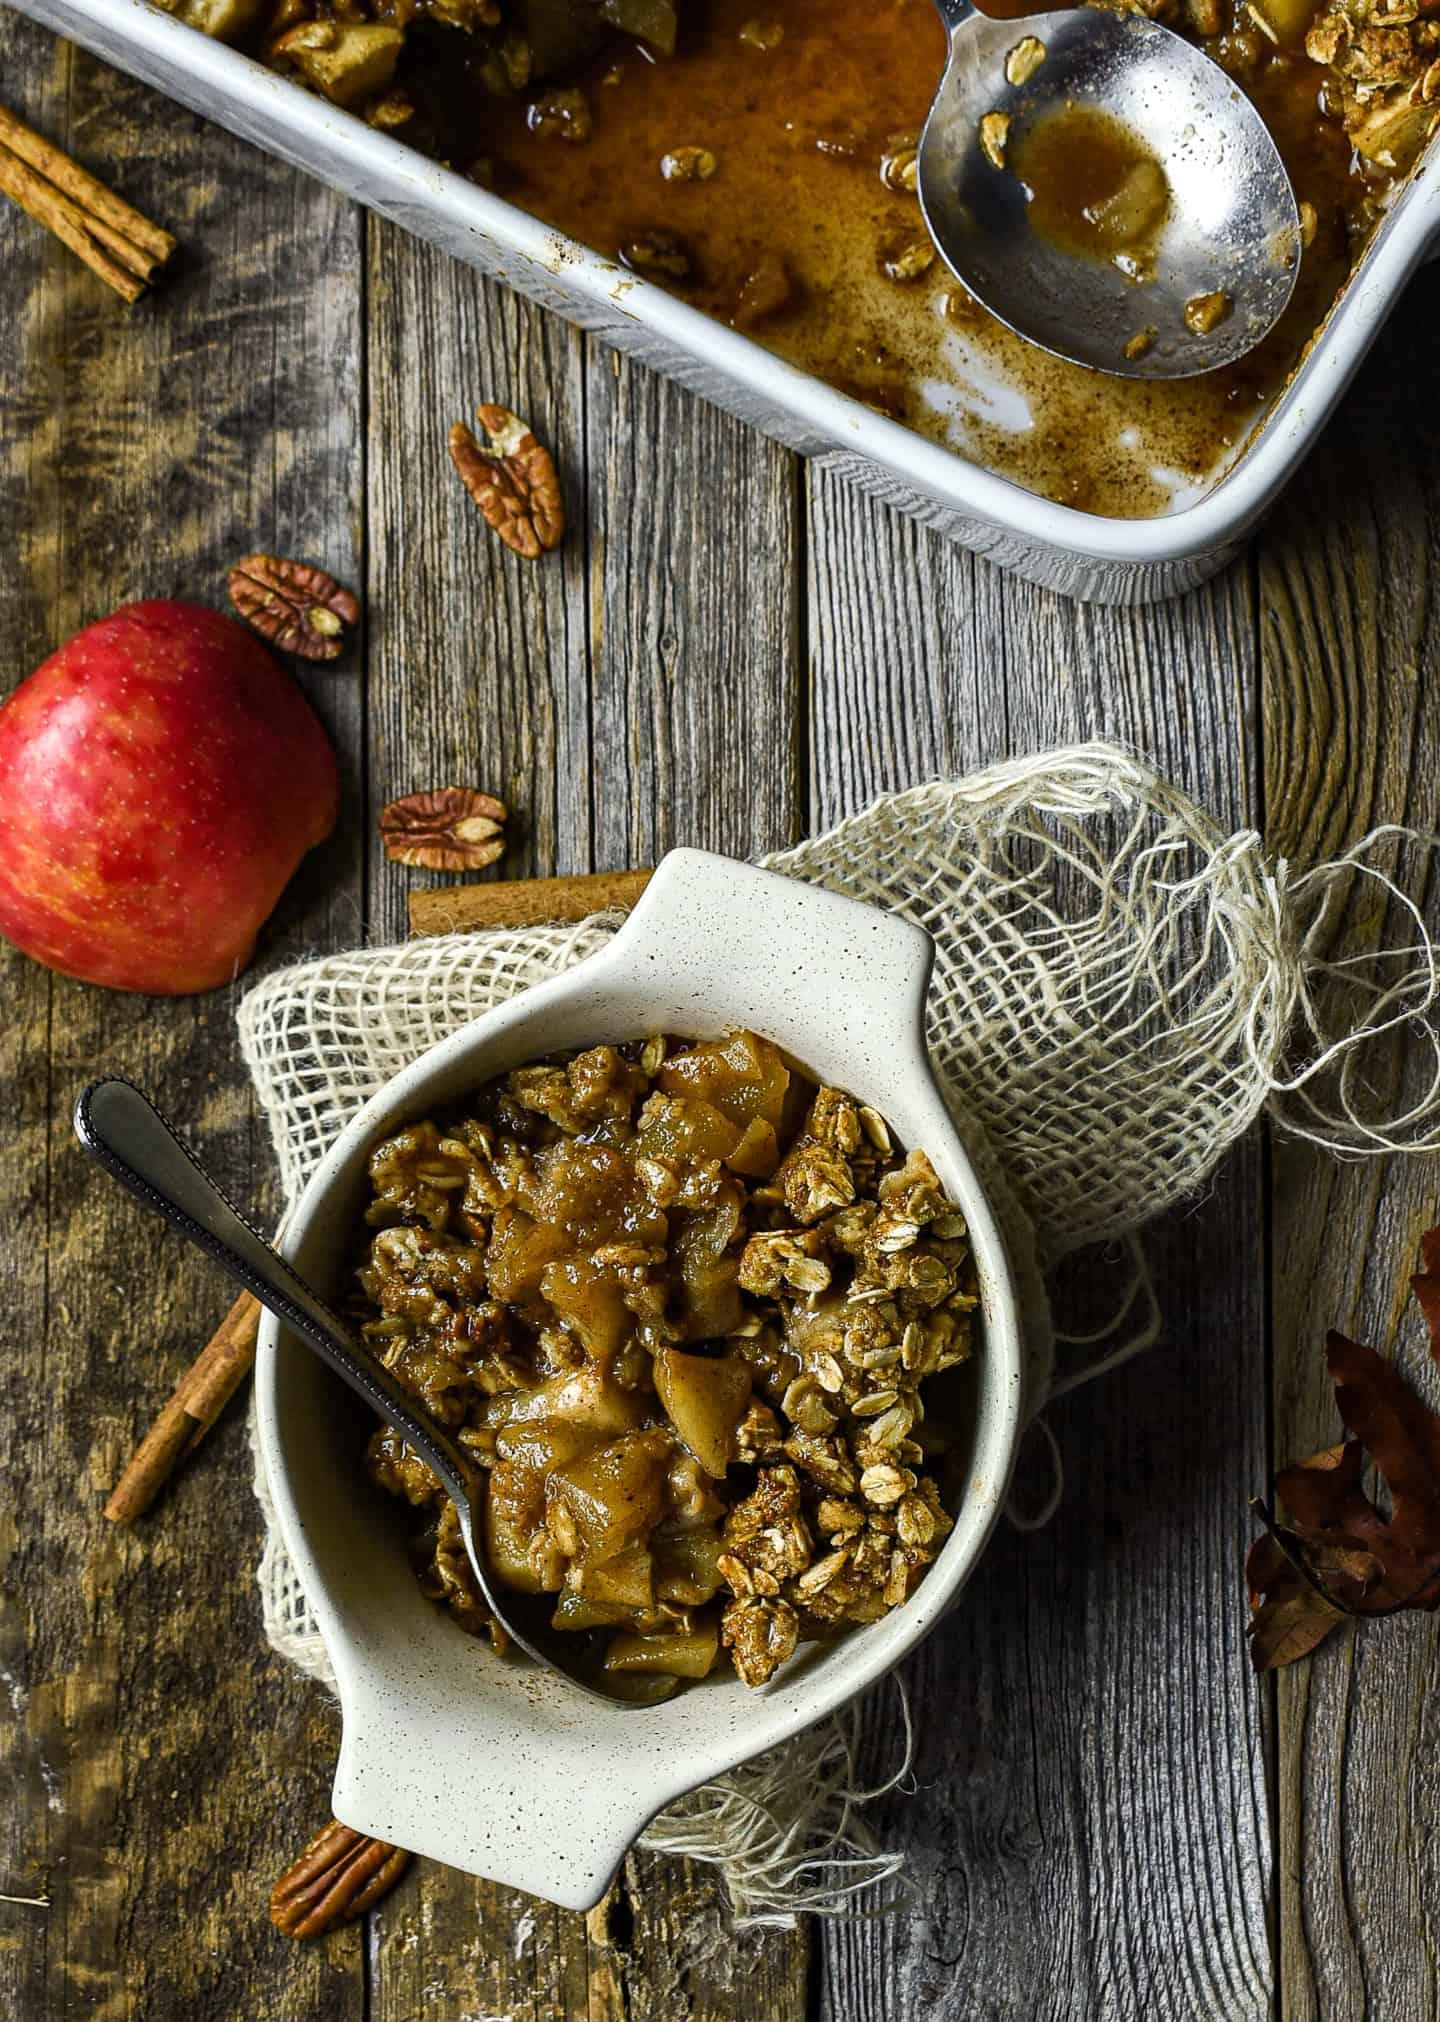 vegan apple crisp in bowl with spoon.